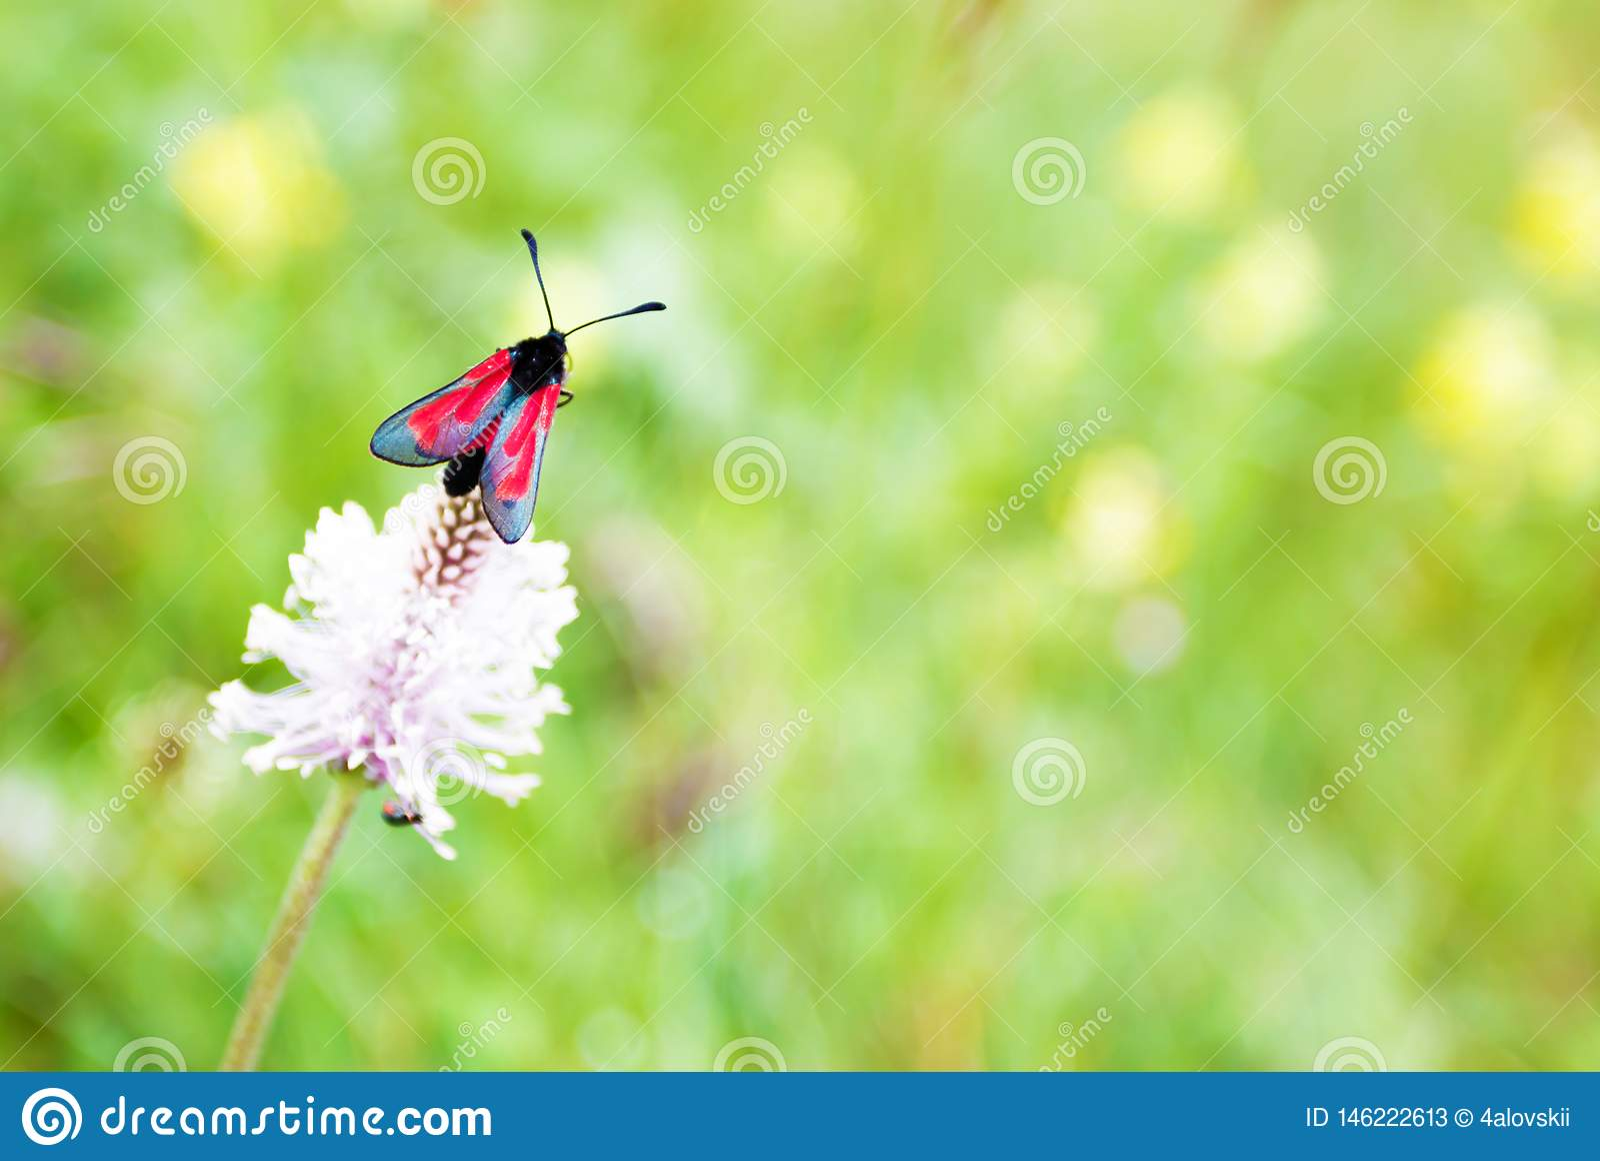 Rode vlinder op klaver, macrofoto